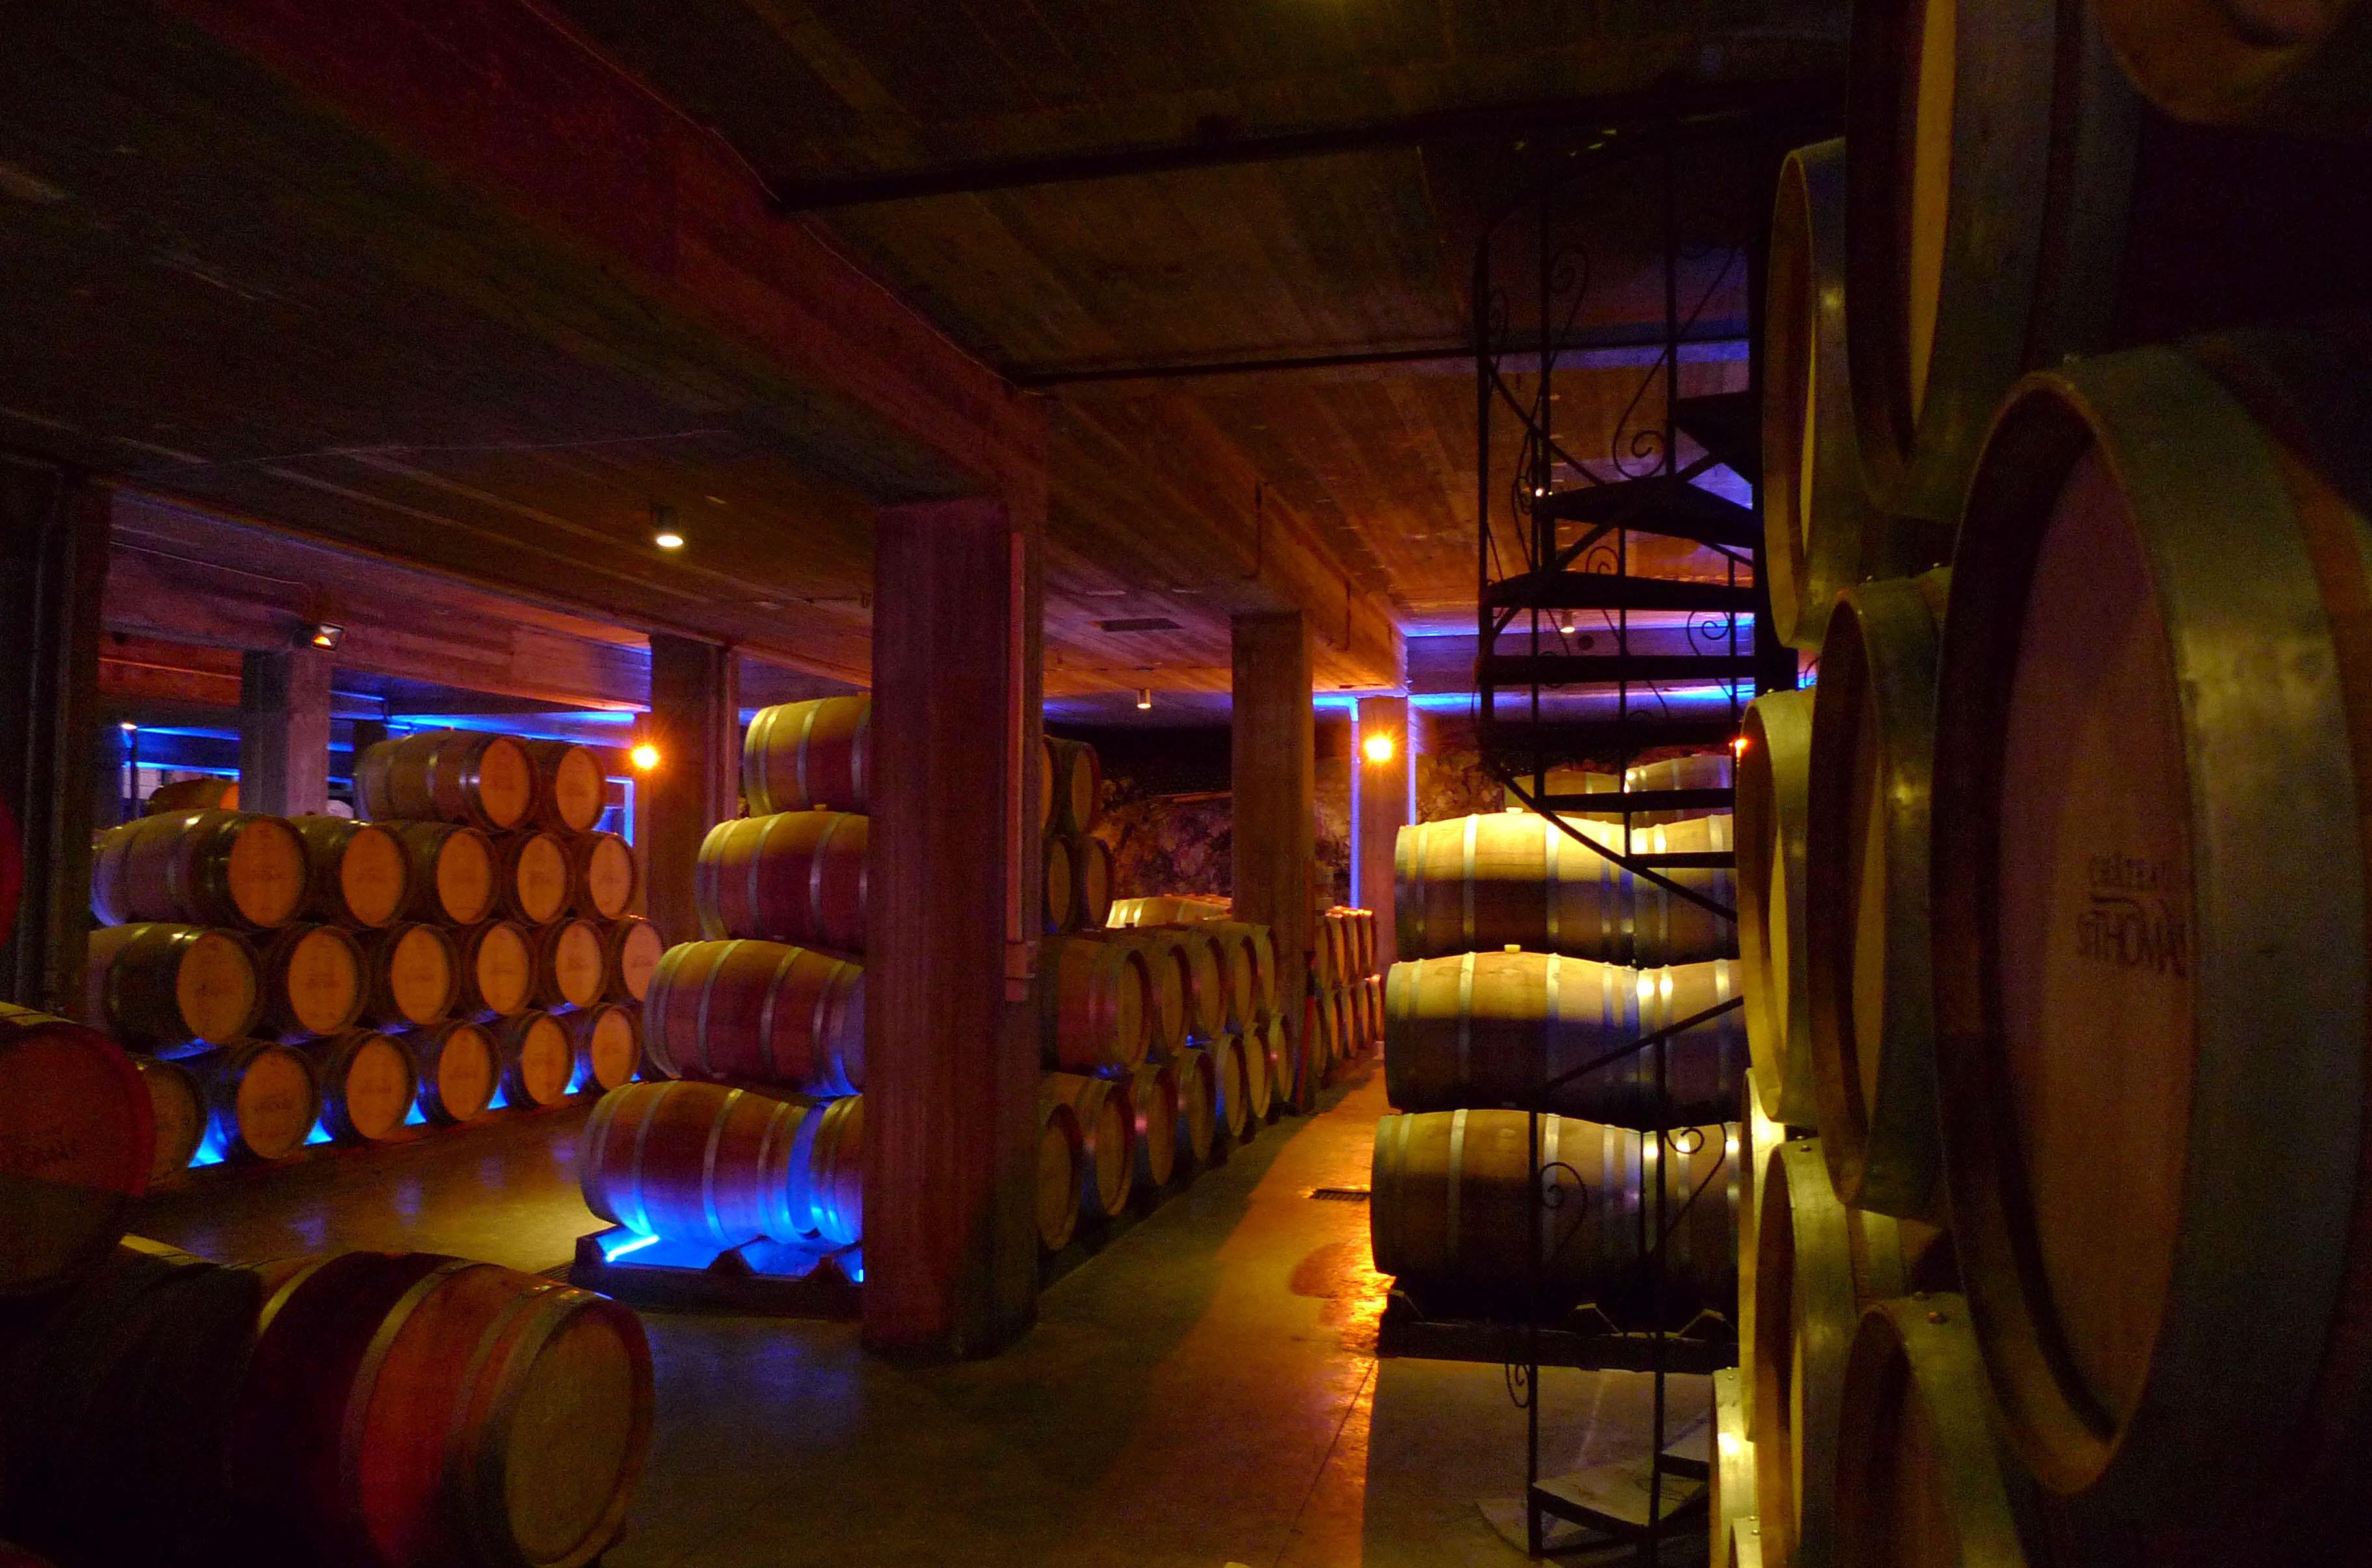 chateau-st-thomas-cellar-lebanon-traveler